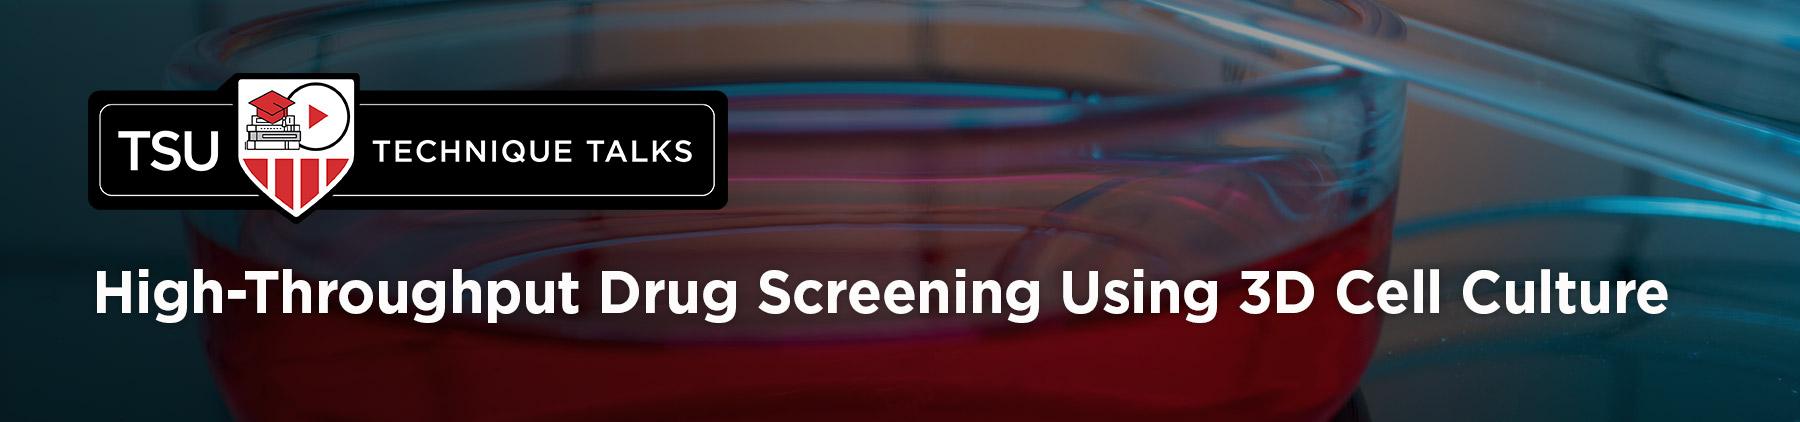 36150-TSU-DrugScreening3DCellCulture-AC-1800x422